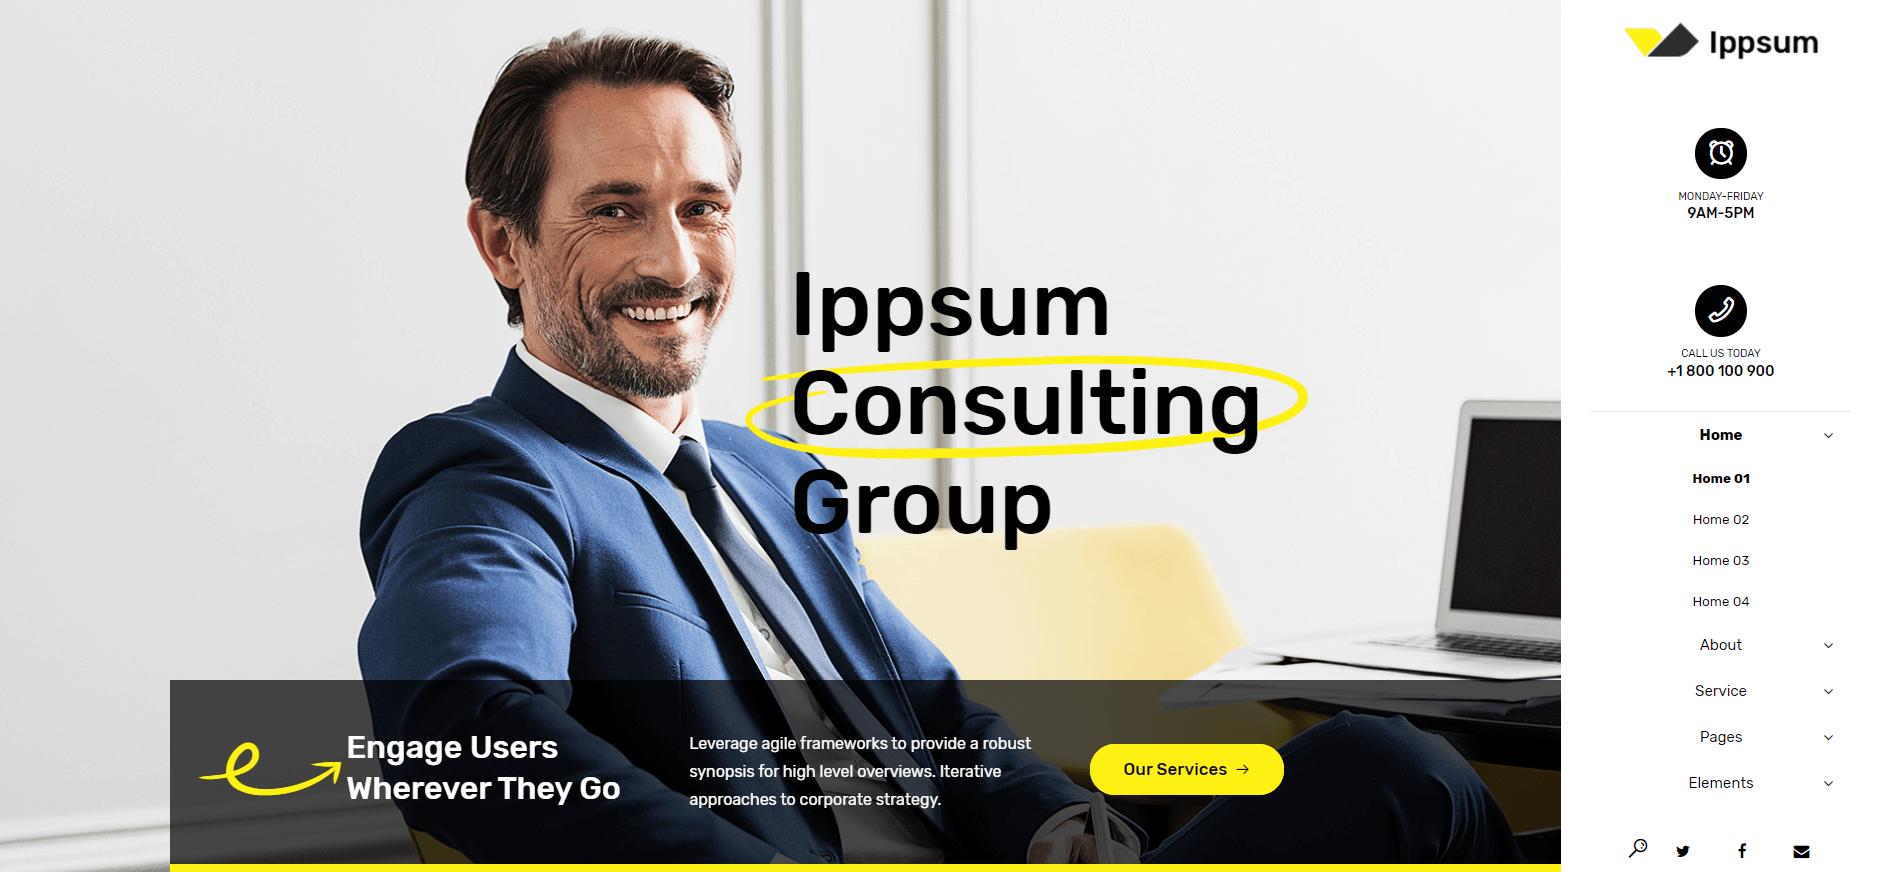 https://documentation.bold-themes.com/ippsum/wp-content/uploads/sites/59/2020/07/menu-vertical-right.png